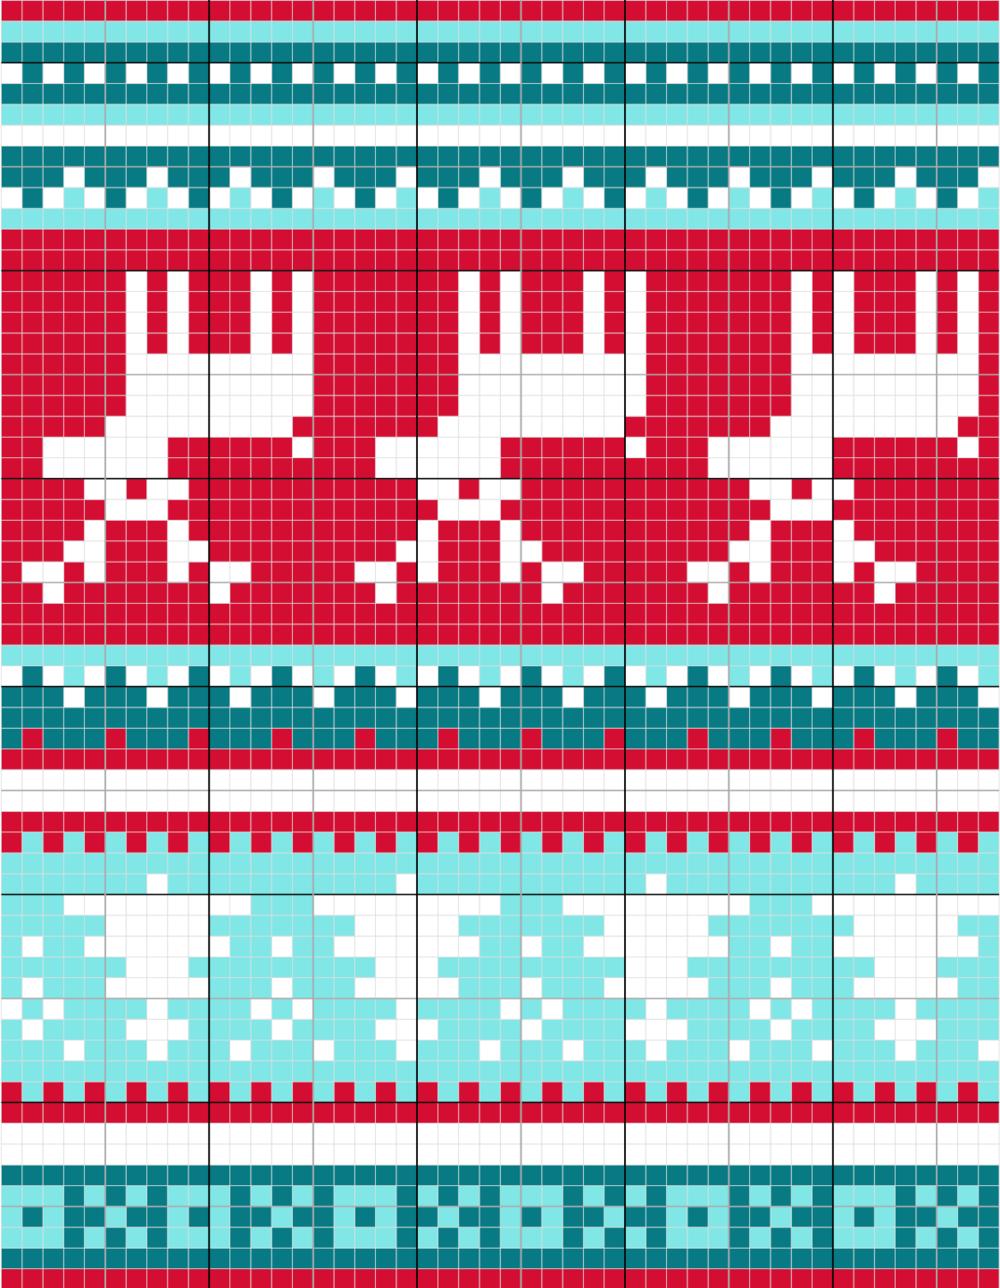 stocking-original1